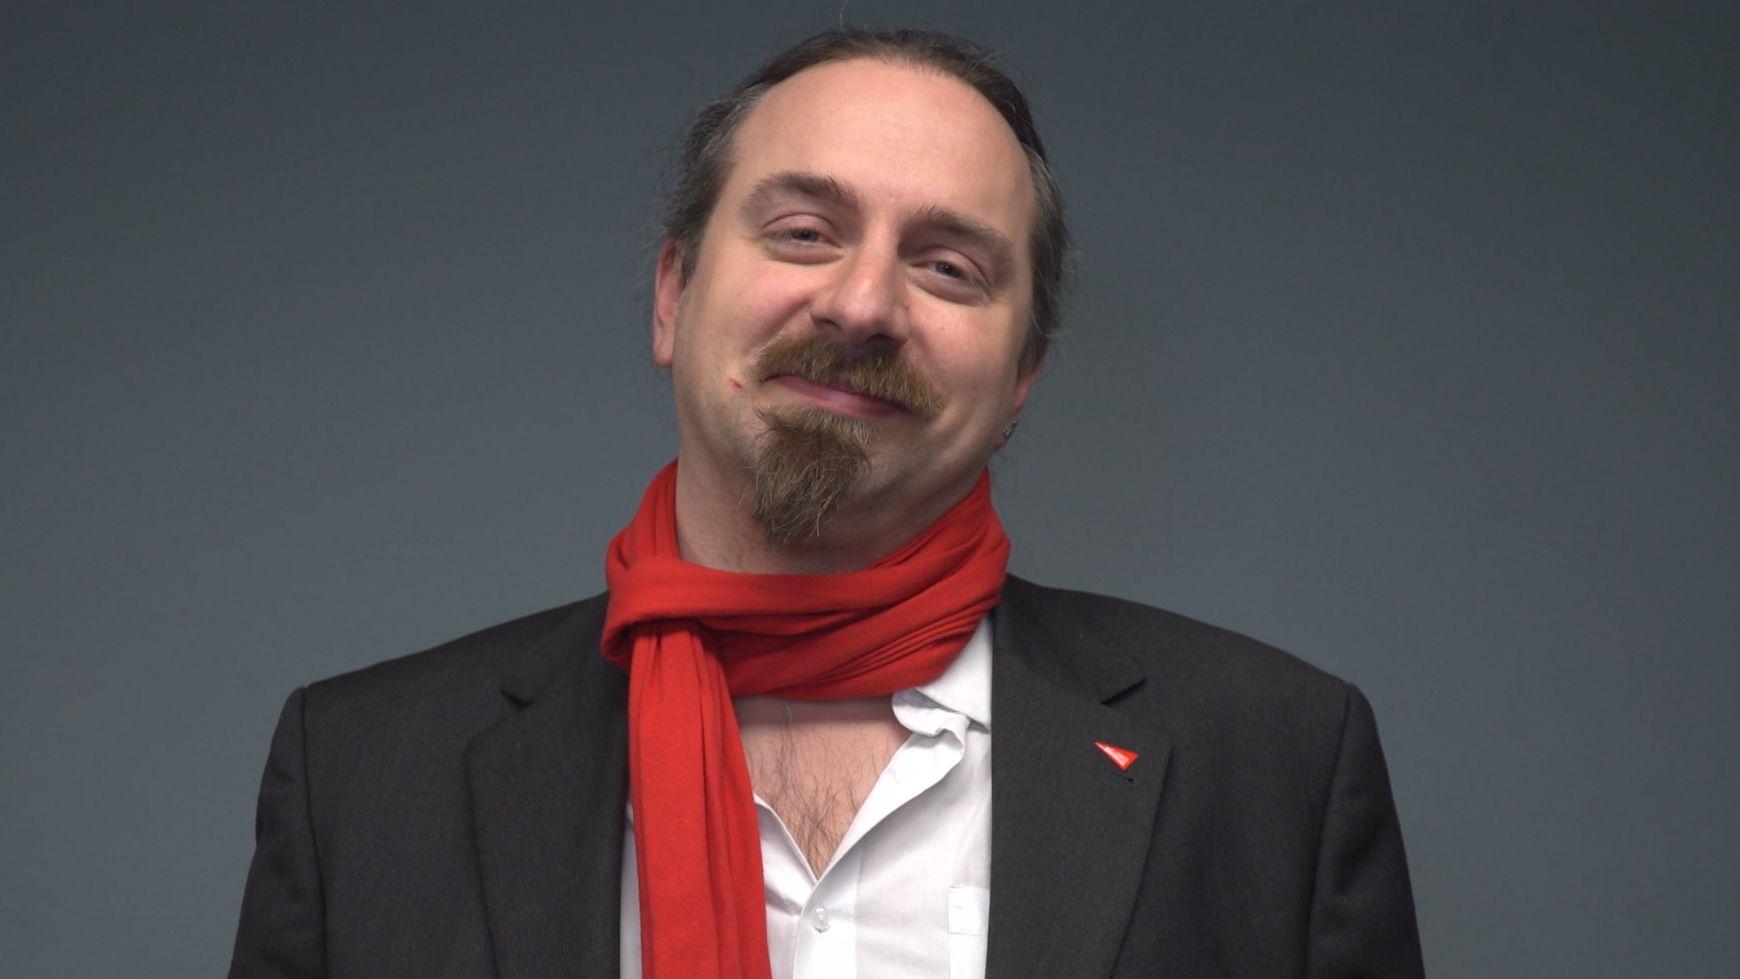 Sebastian Roth, OB-Kandidatin der Linken in Würzburg